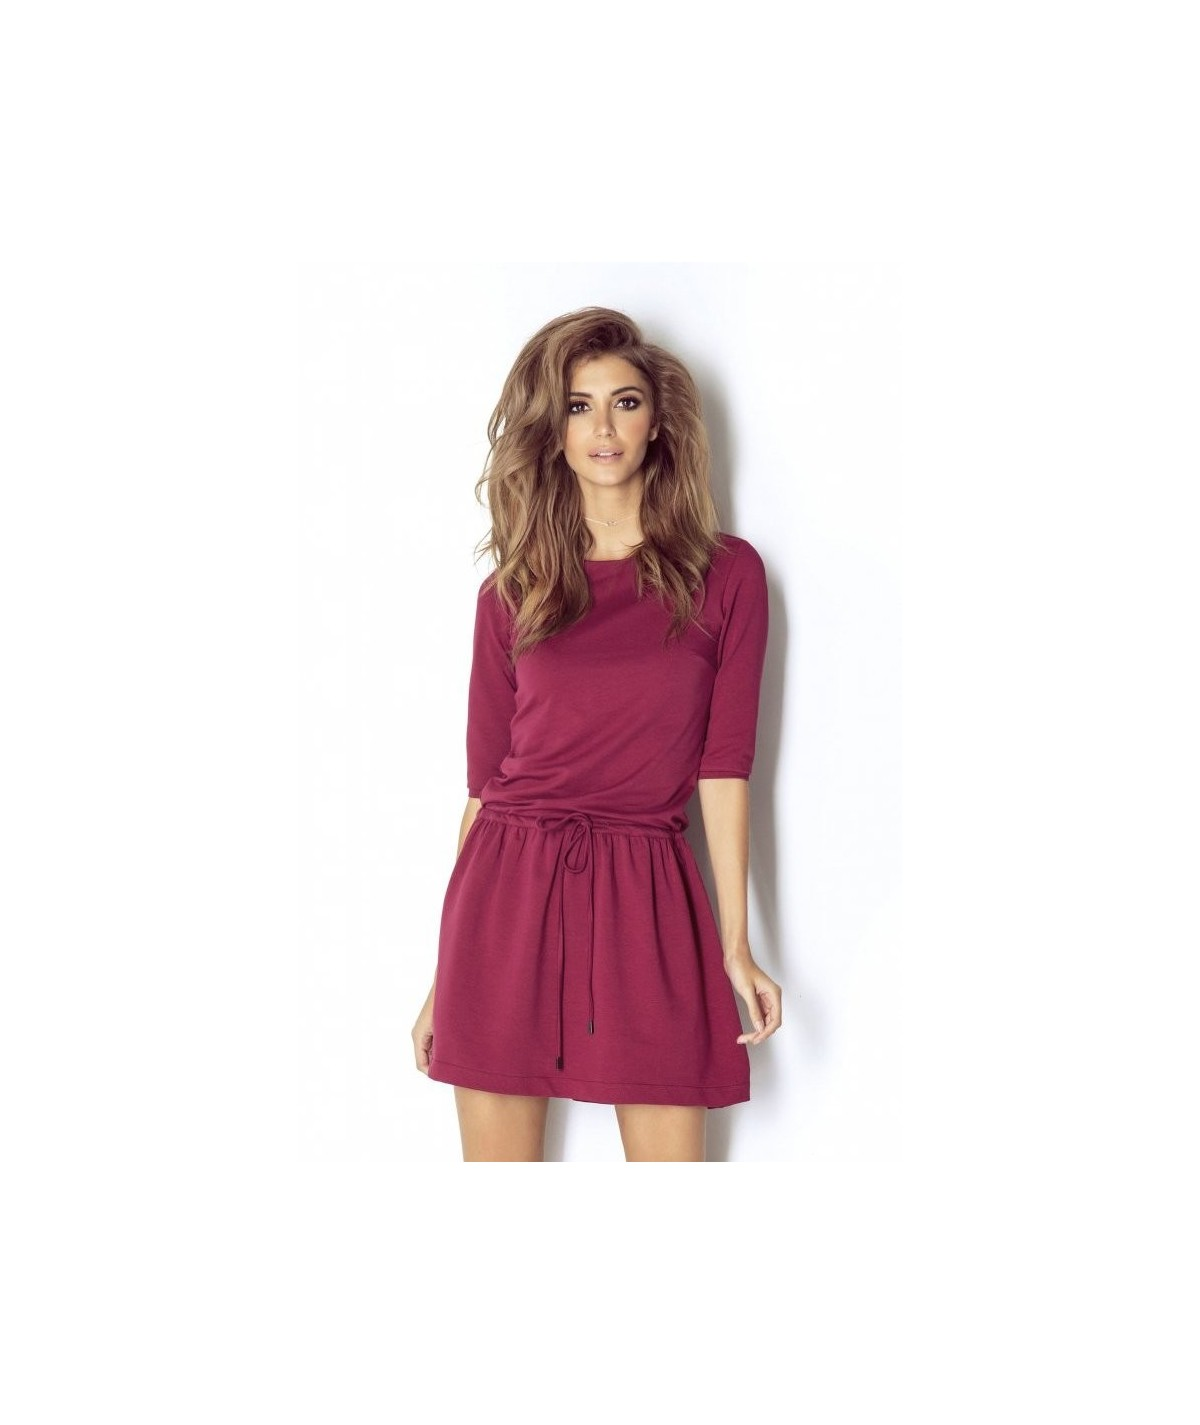 bordowa sportowa sukienka mini NATHALIE